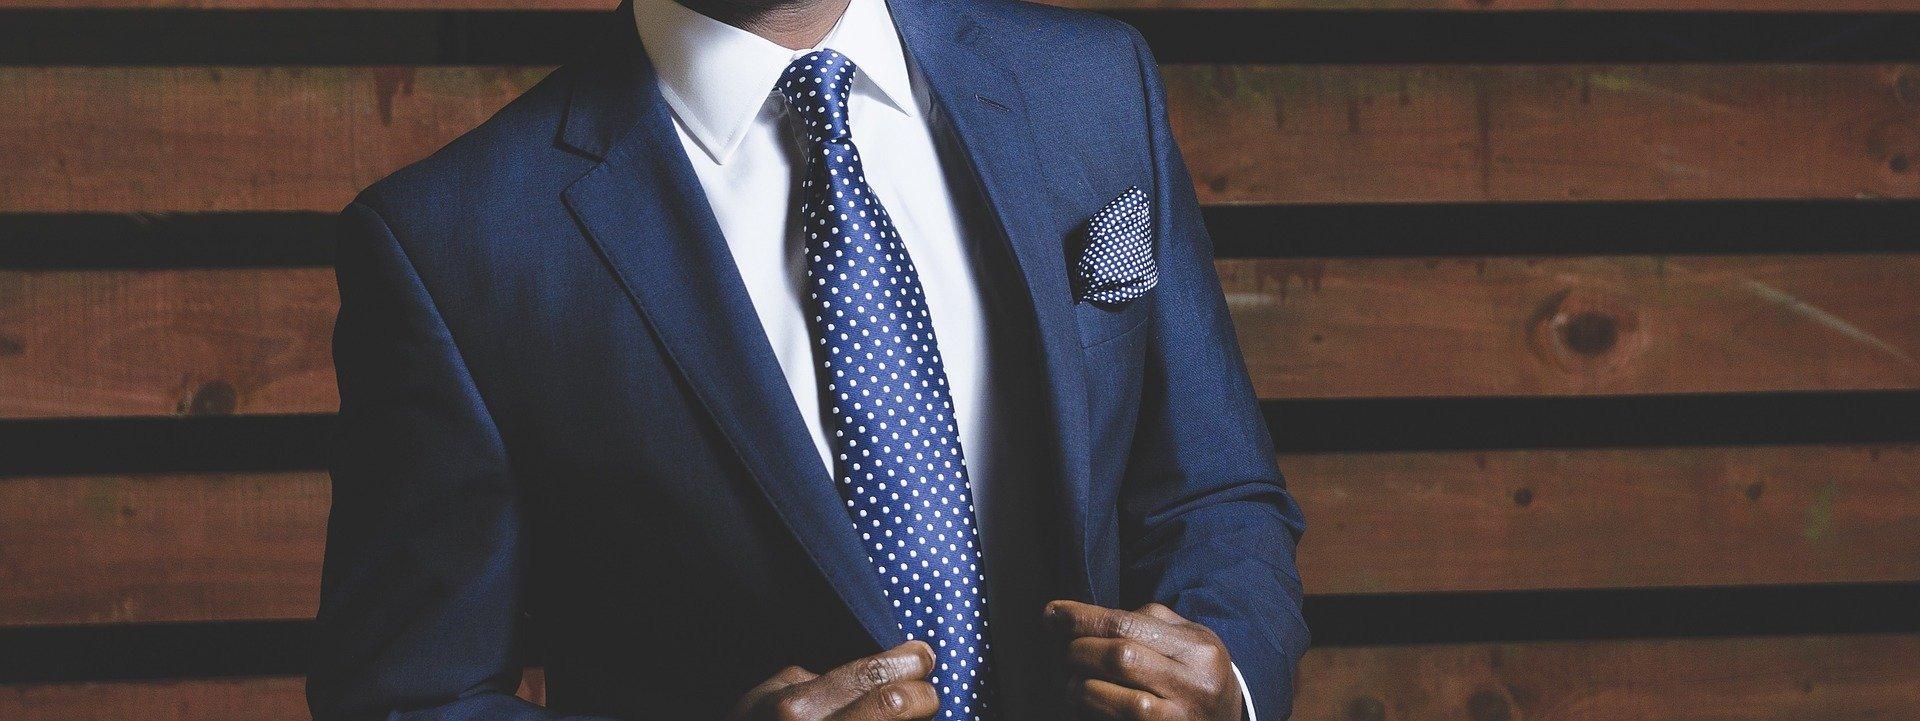 cravate homme tendance